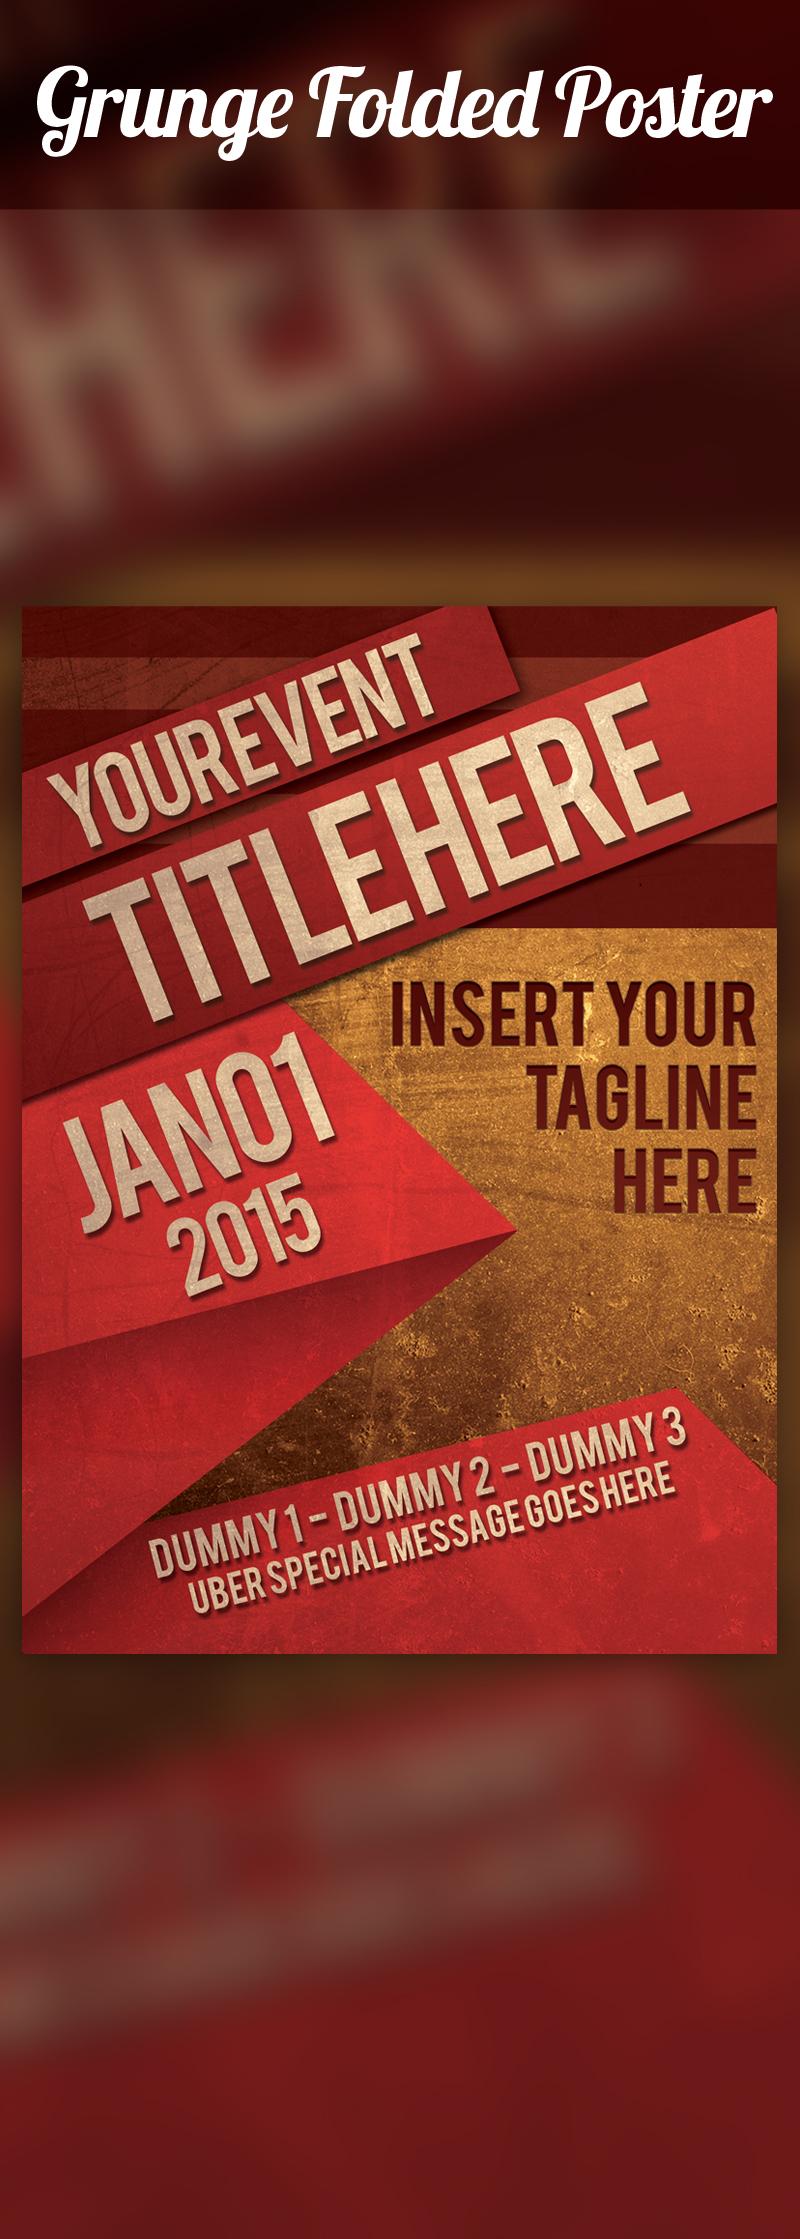 Grunge Folded Poster